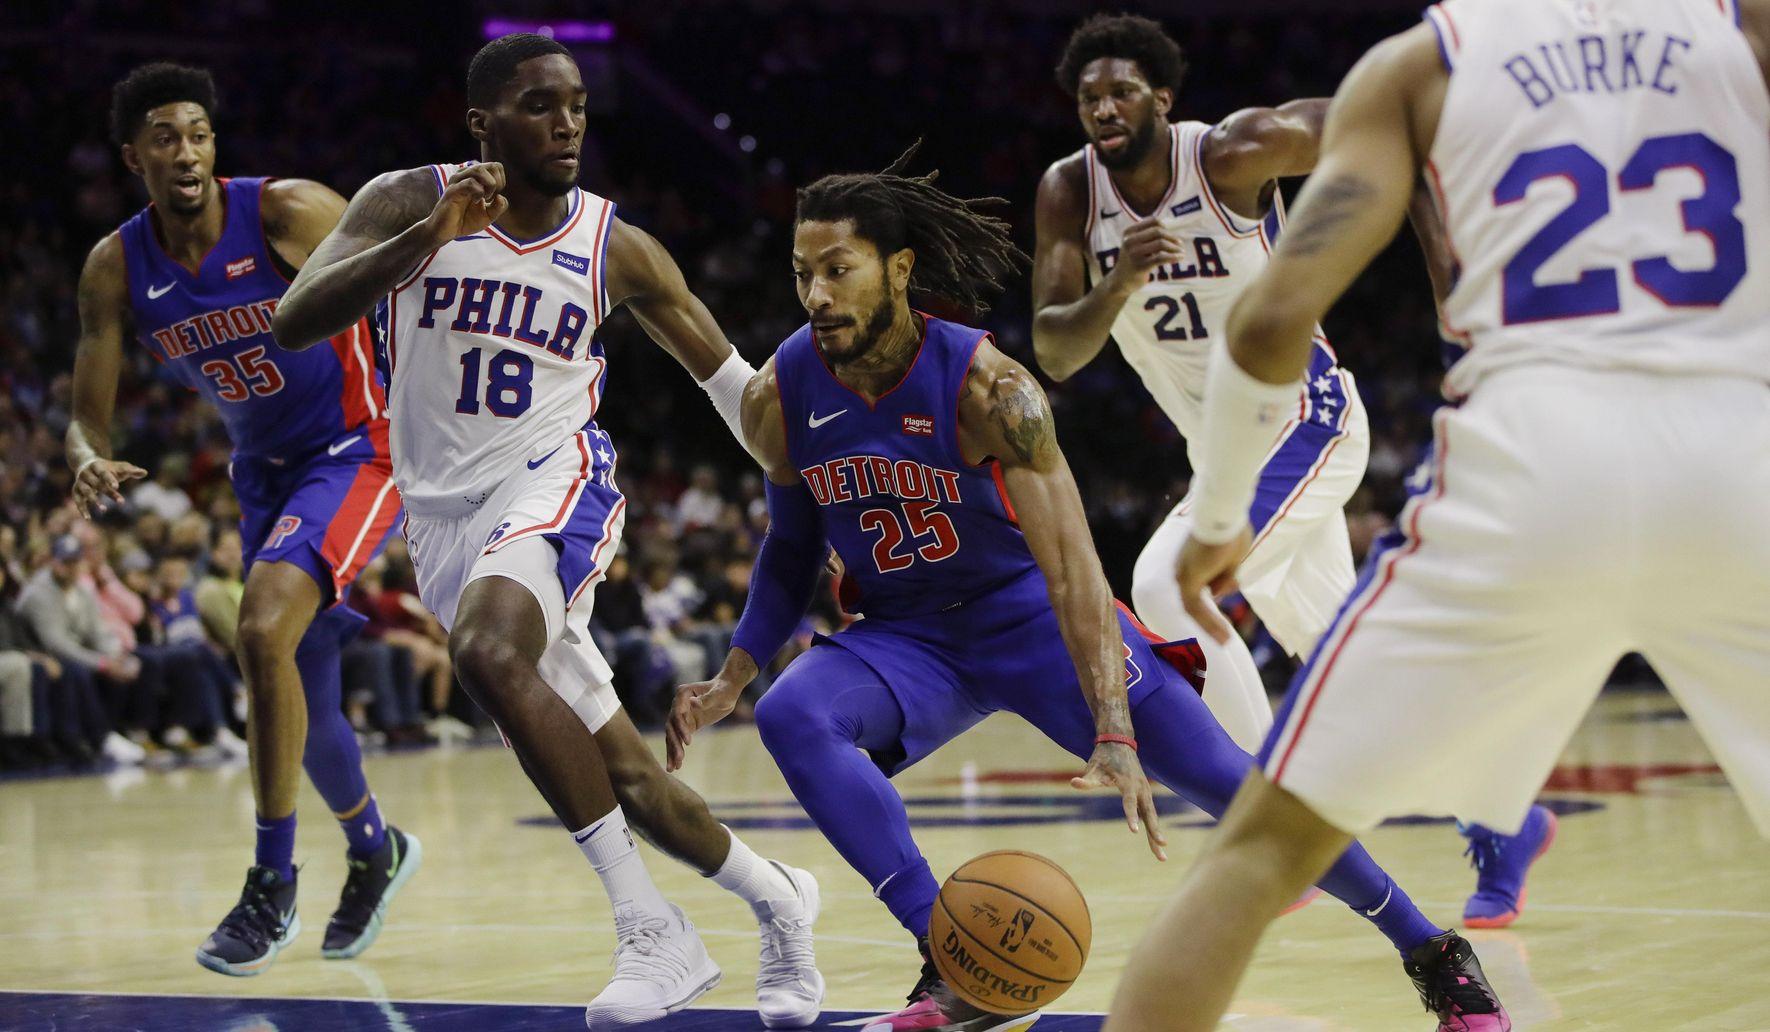 Pistons_76ers_basketball_01309_c0-214-5127-3203_s1770x1032